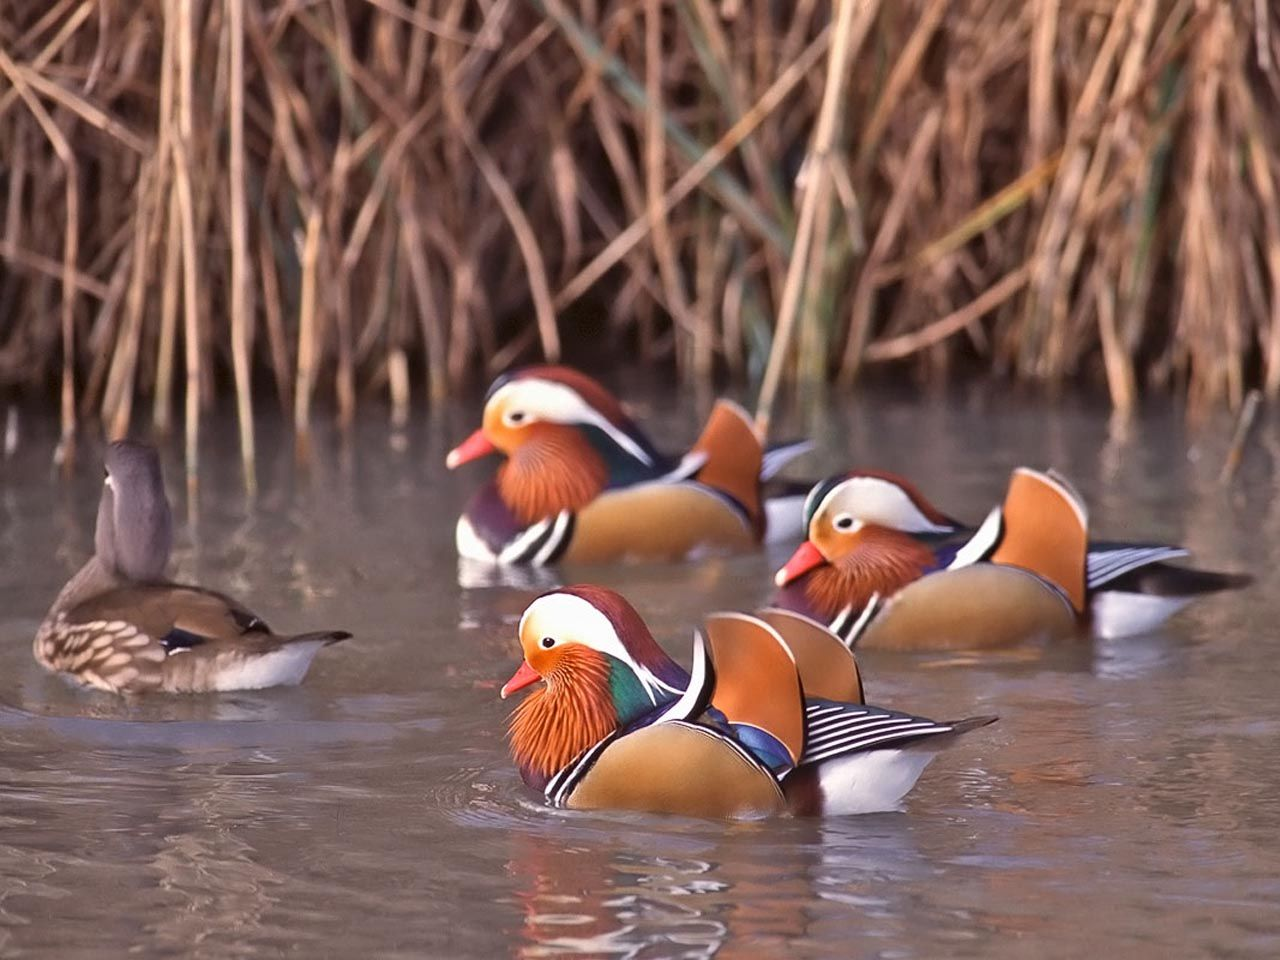 Small Mandarin Ducks In The Water Wallpaper 1280x960